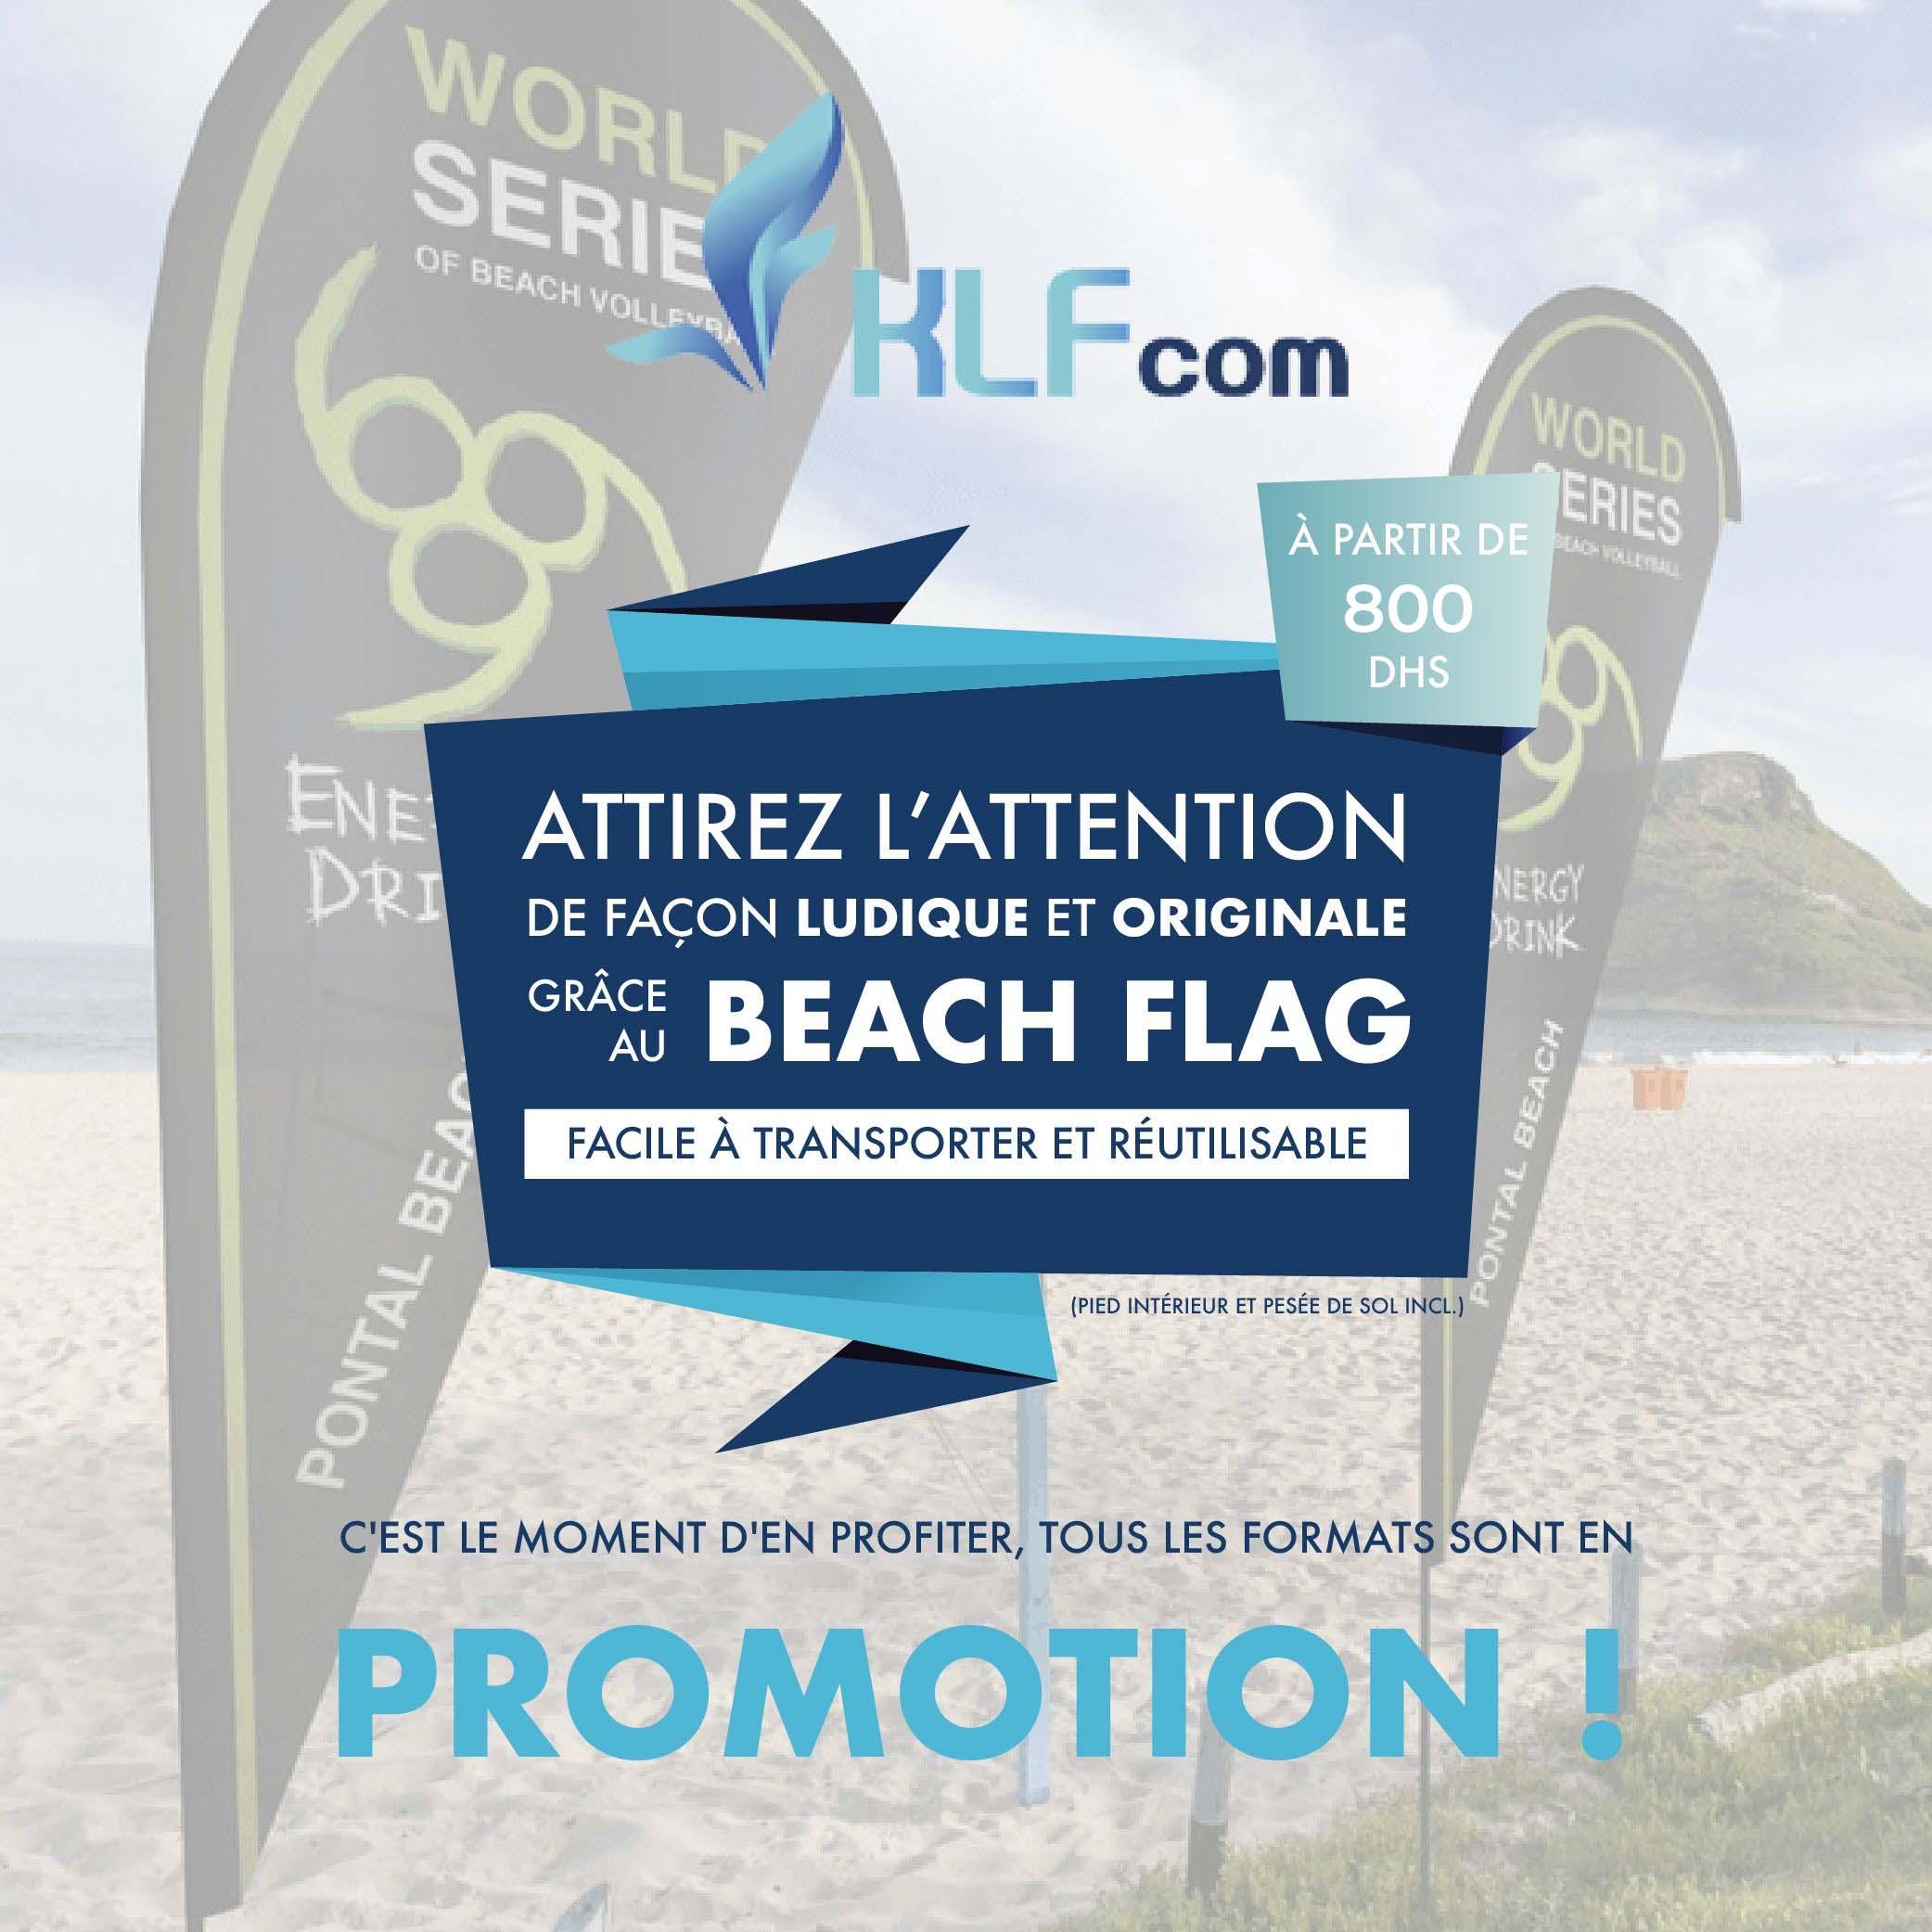 Promotions KLF Com 3